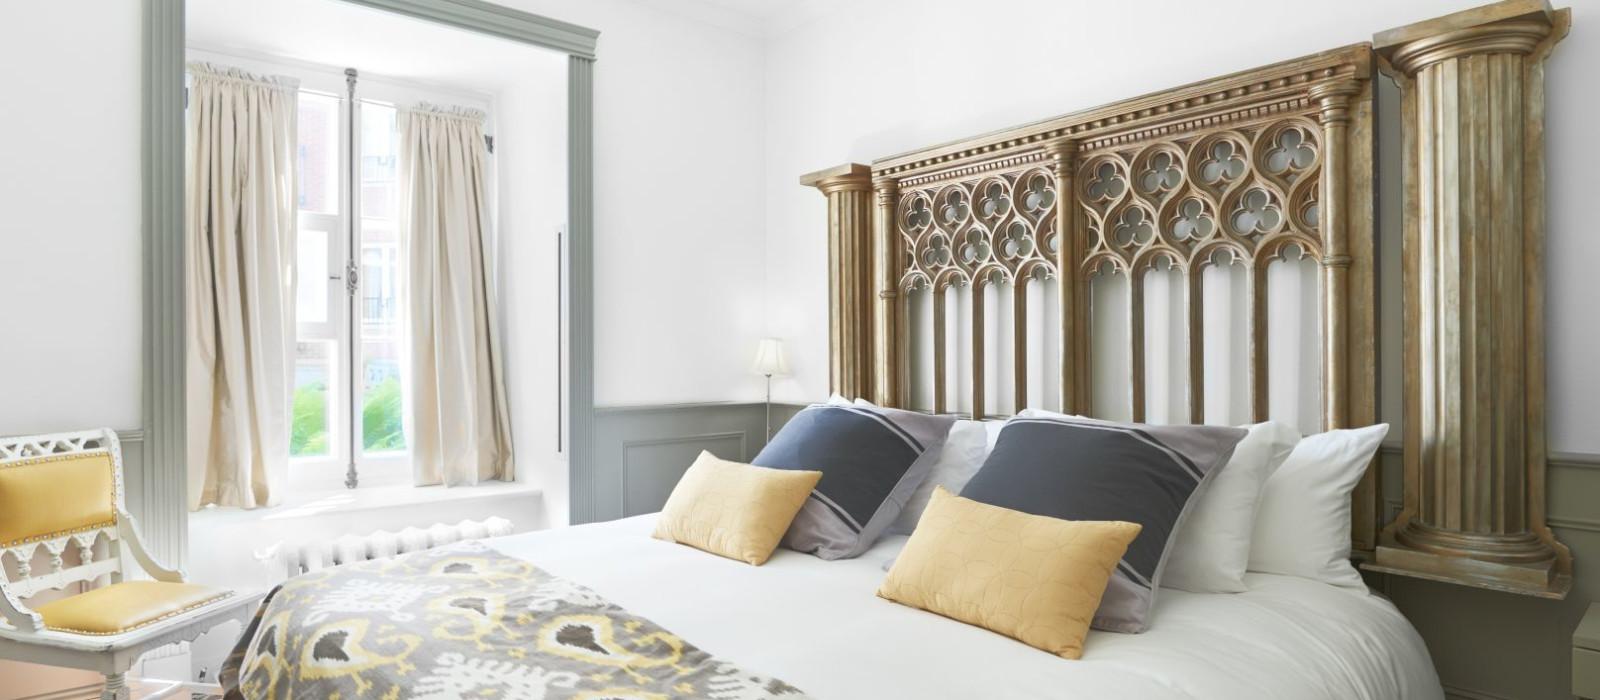 Hotel Auberge Saint-Antoine Relais & Châteaux Kanada